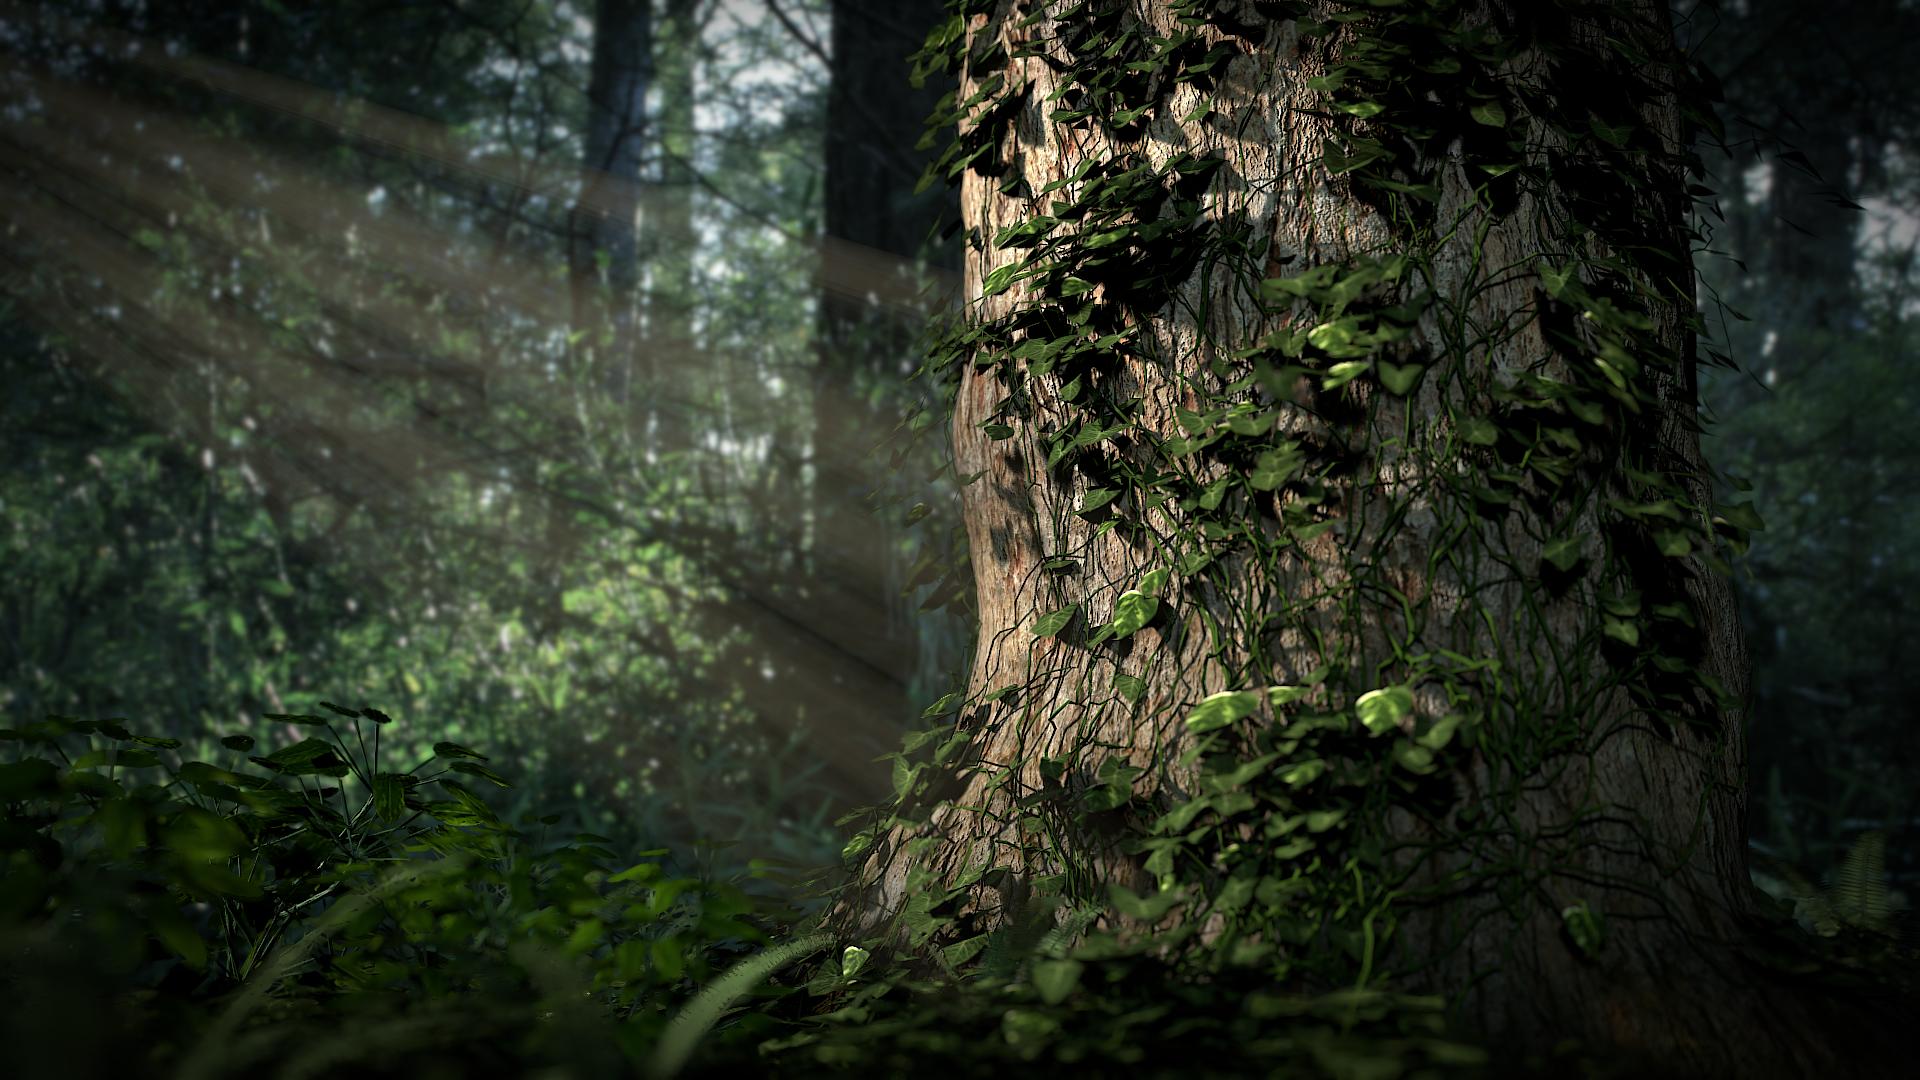 Forest Scene by SXPanda on DeviantArt: sxpanda.deviantart.com/art/Forest-Scene-282696853